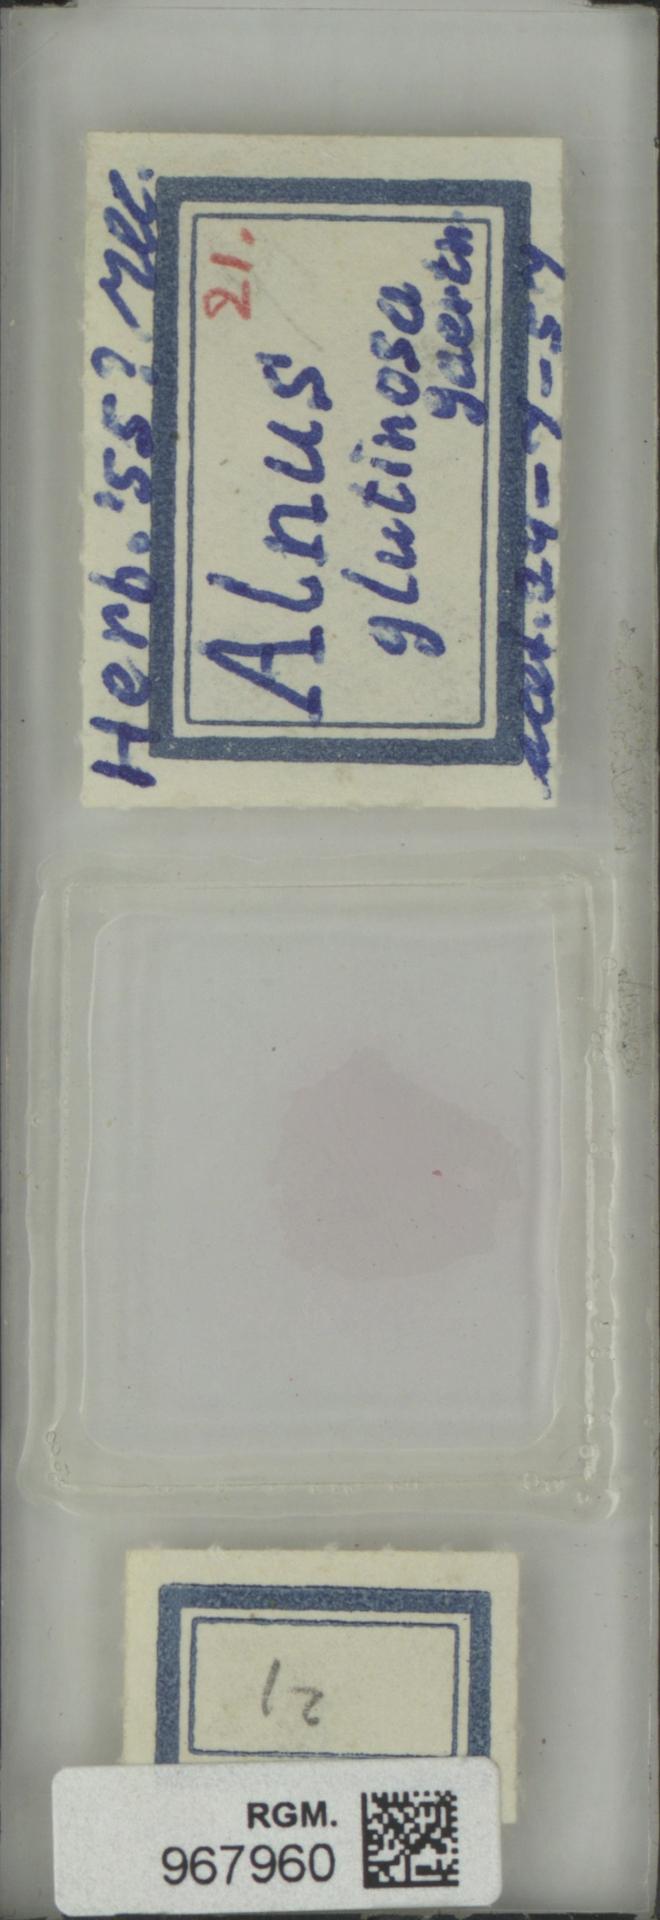 RGM.967960 | Alnus glutinosa